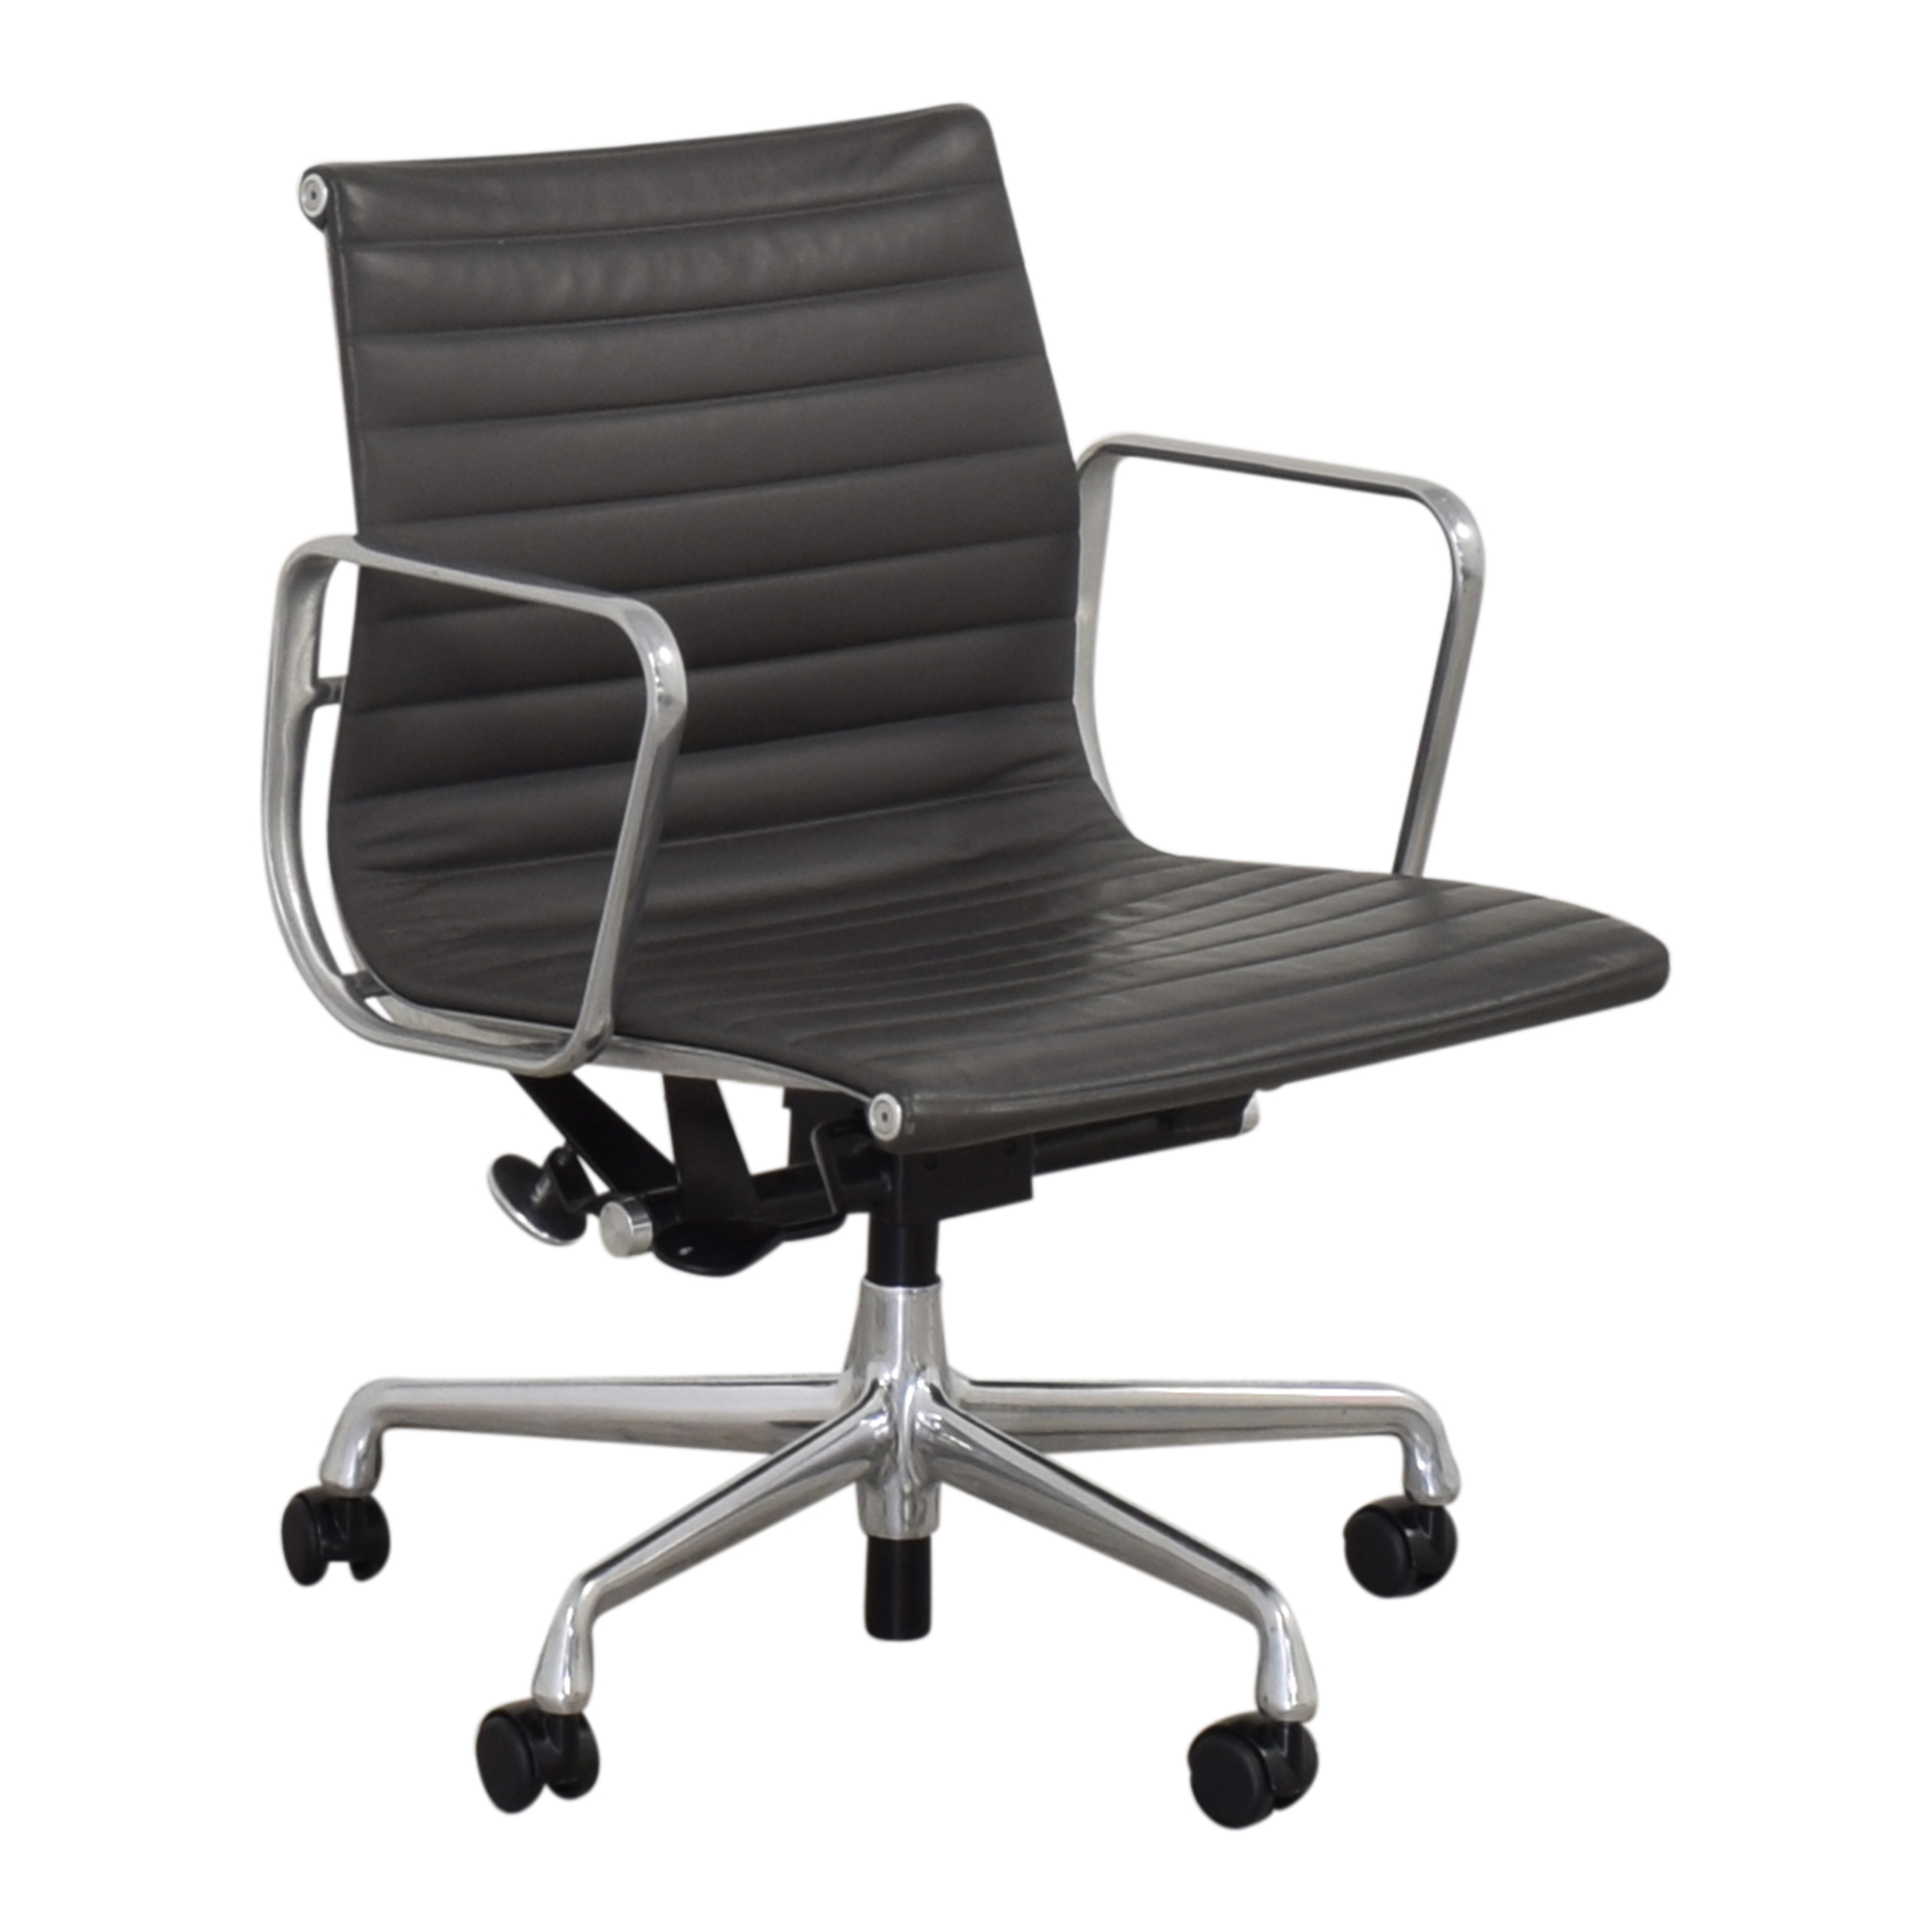 Herman Miller Eames Aluminum Group Management Chair sale